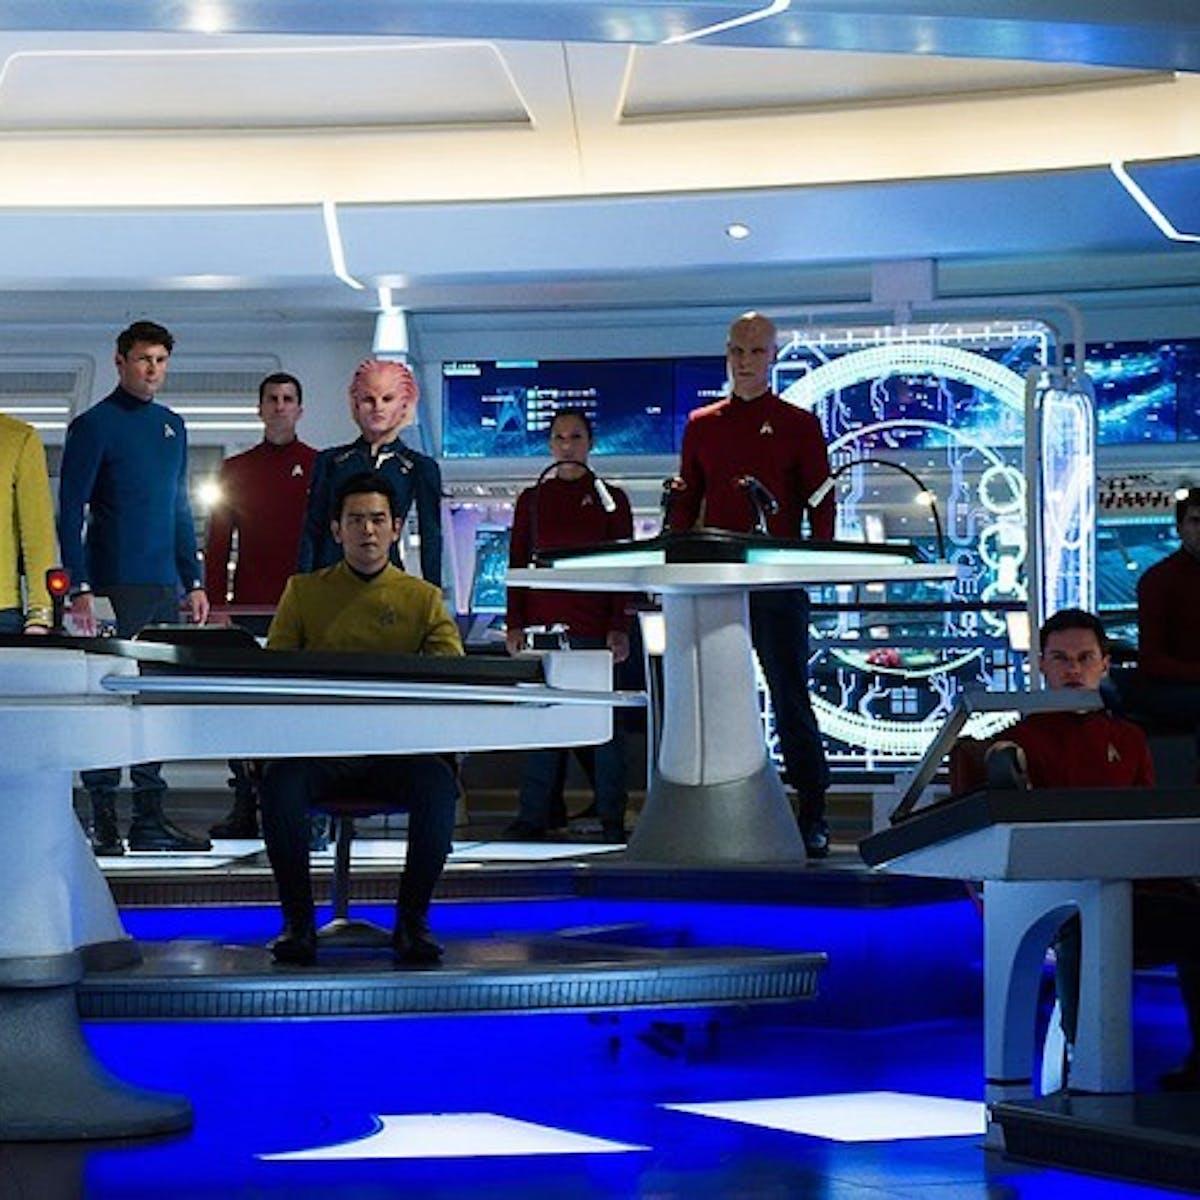 Crisis On Infinite Enterprises: Where Do the 'Star Trek' Movies Go After 'Beyond?